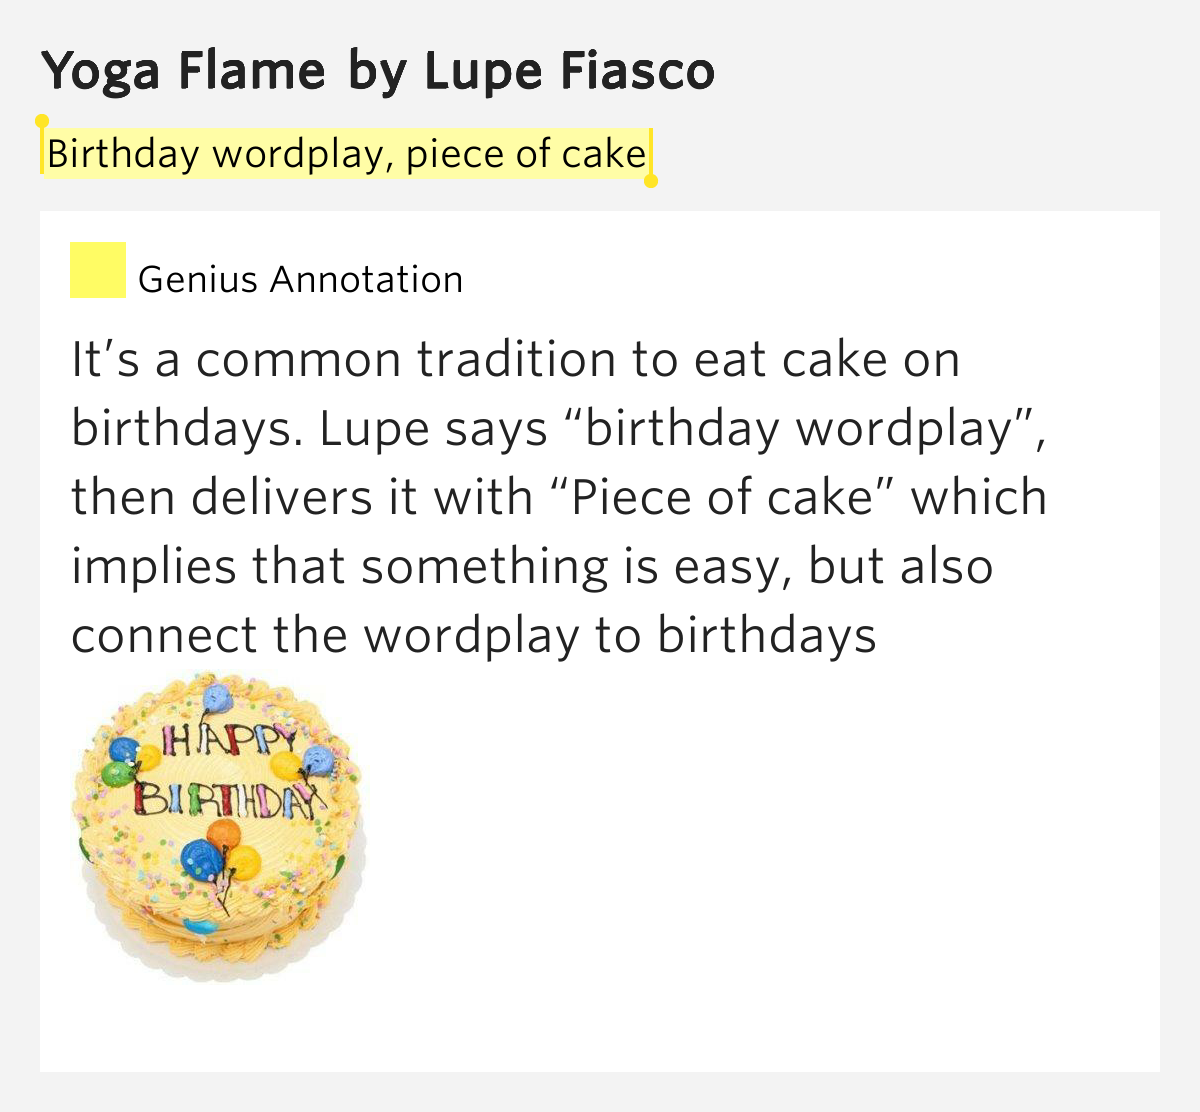 Birthday Wordplay, Piece Of Cake